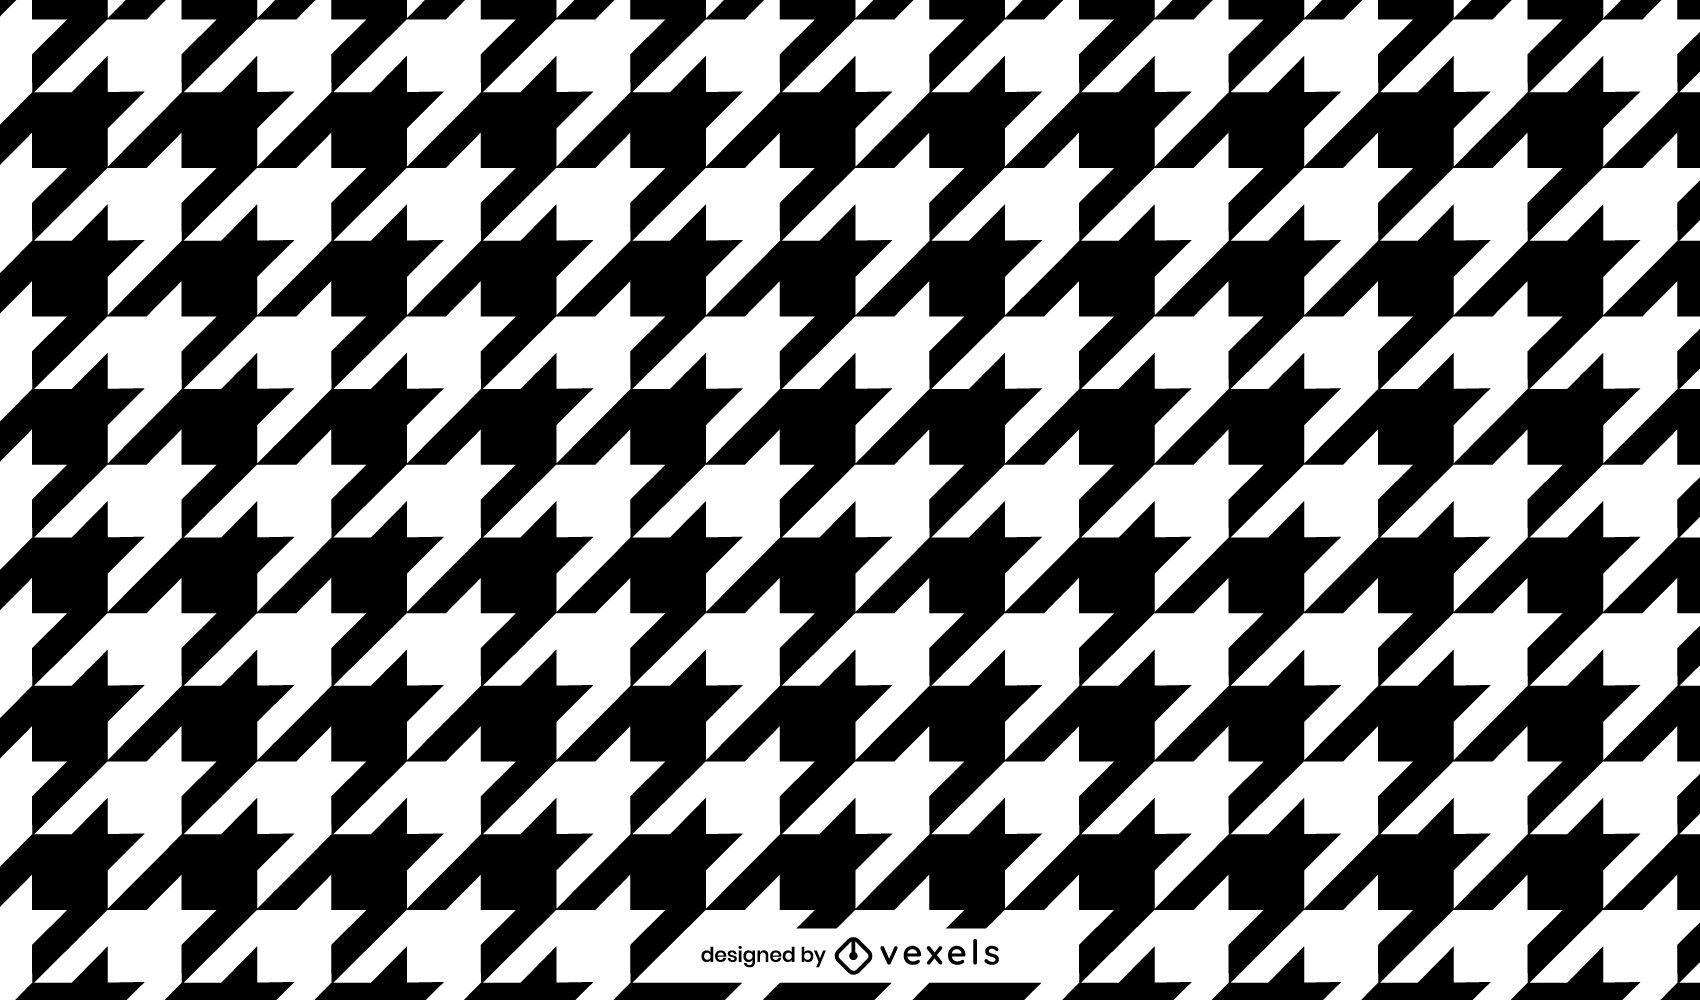 Houndstooth pattern design